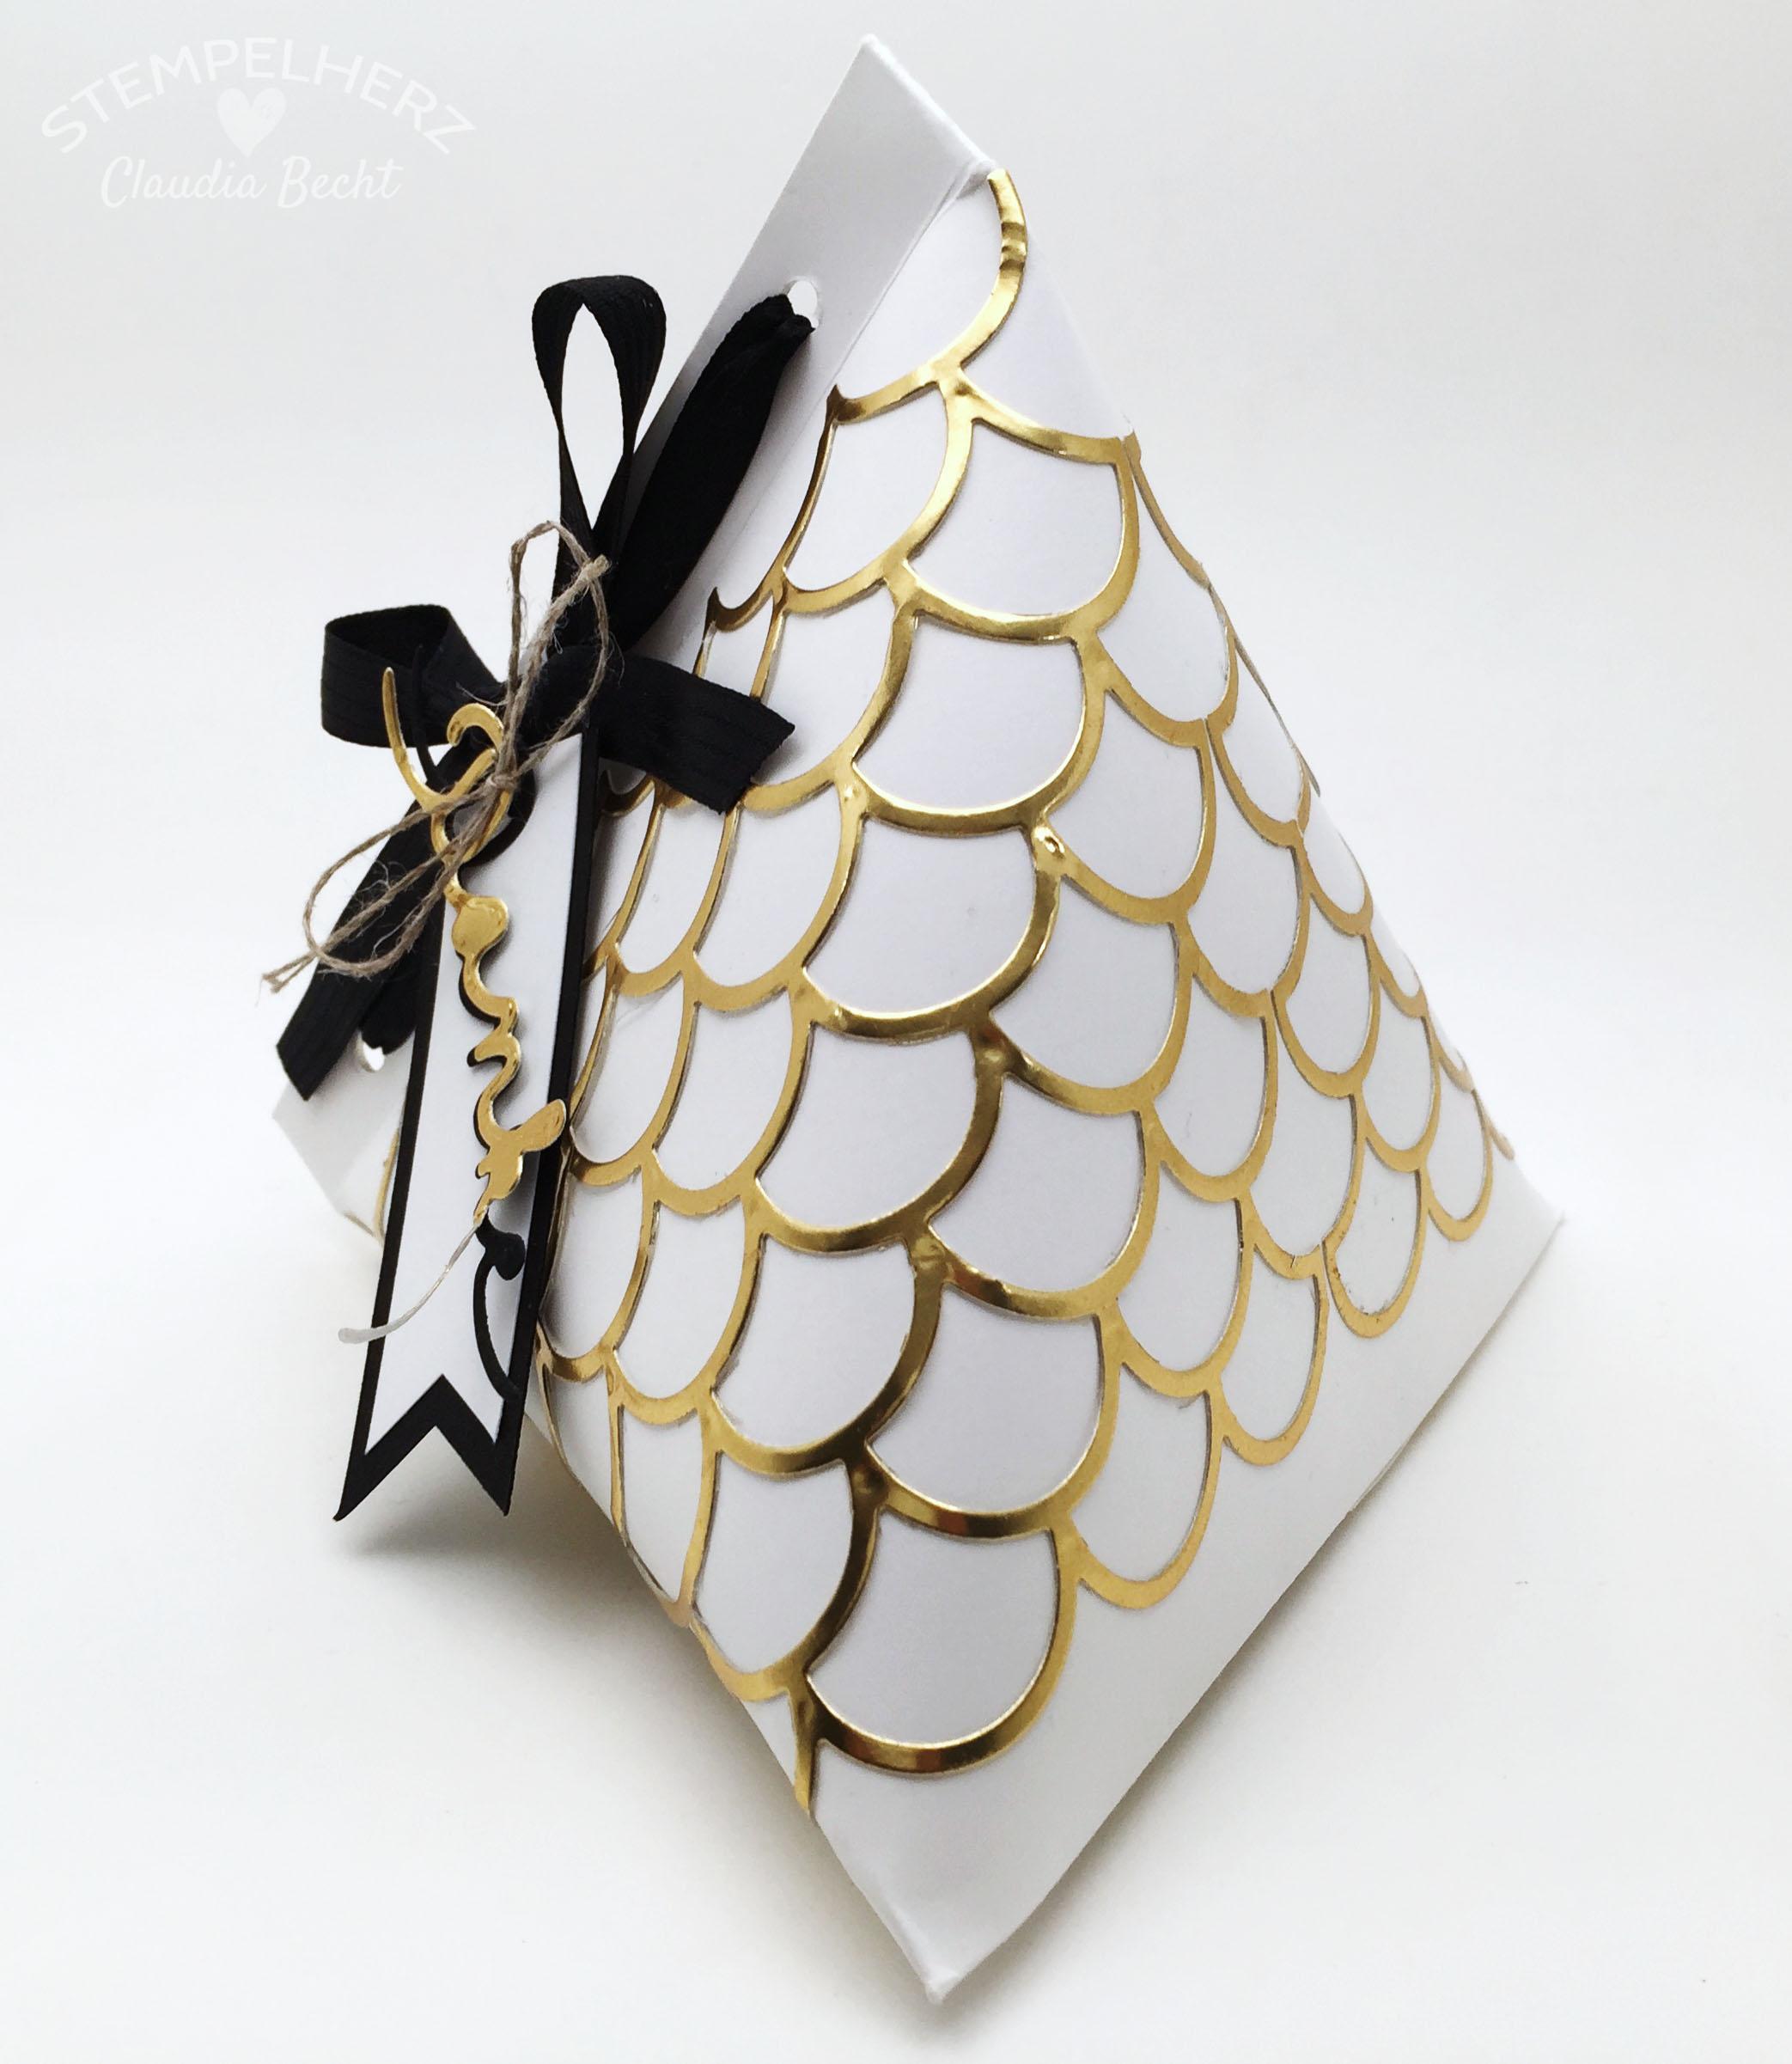 Stampin Up-Stempelherz-Verpackung-Box-Tetra Pak-Verpackung Danke Gold-Schwarz-Weiß 04b